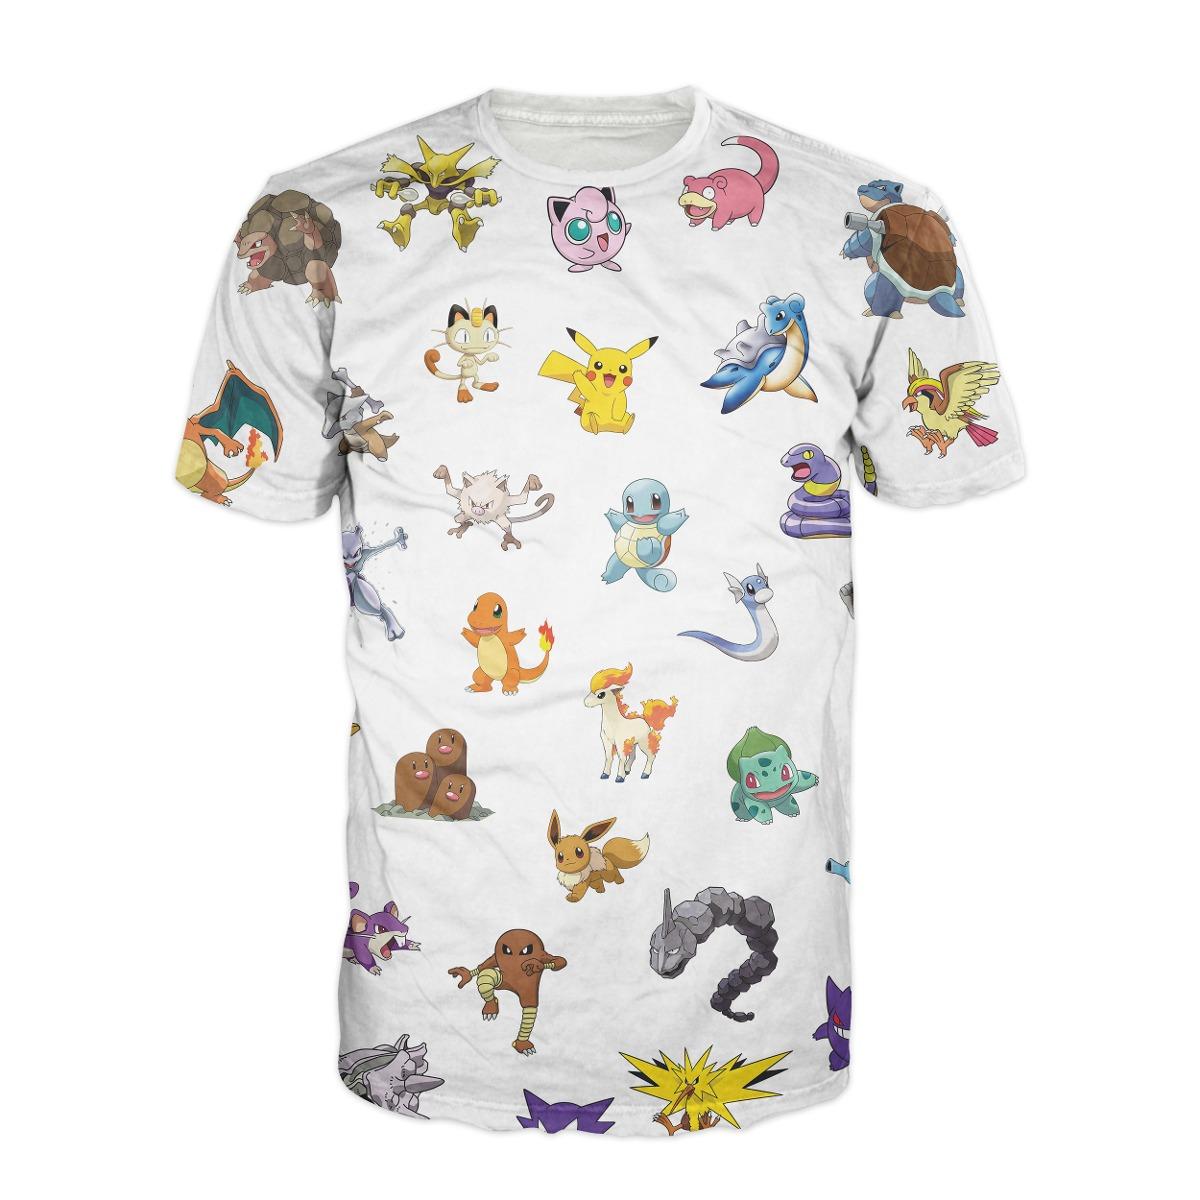 5d78d1b090 Camisa Geek Pokemon - Camiseta Nerd Anime Pikachu Desenho - R  74